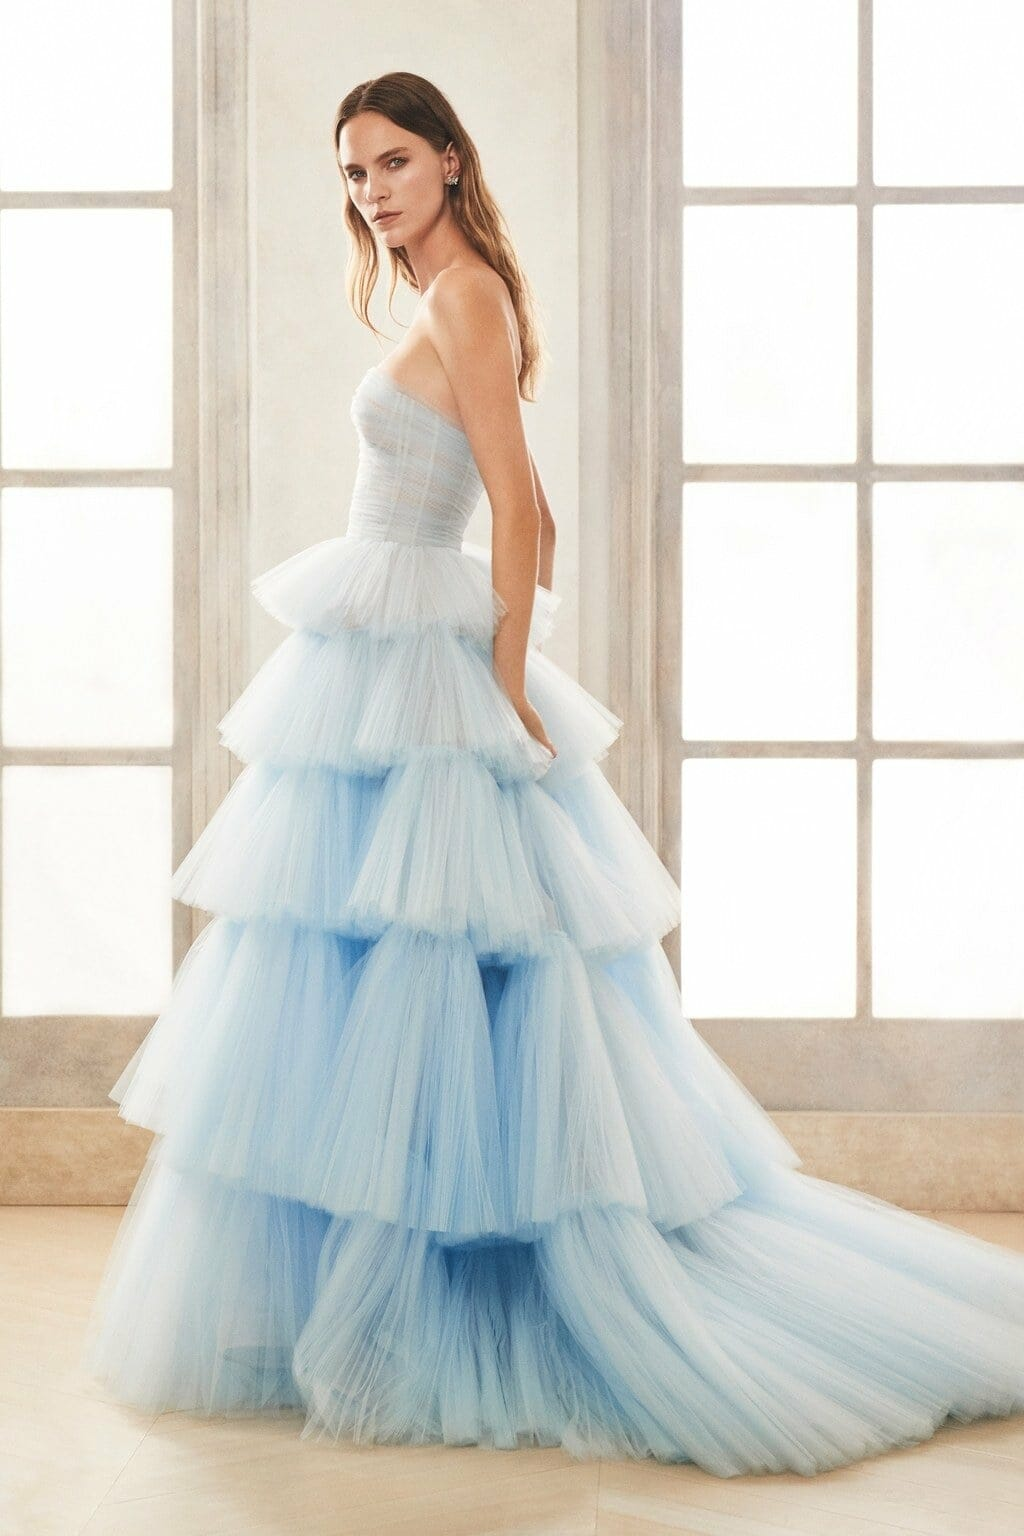 Oscar de la Renta Bridal Fall Winter 2020-2021. RUNWAY MAGAZINE ® Collections. RUNWAY NOW / RUNWAY NEW